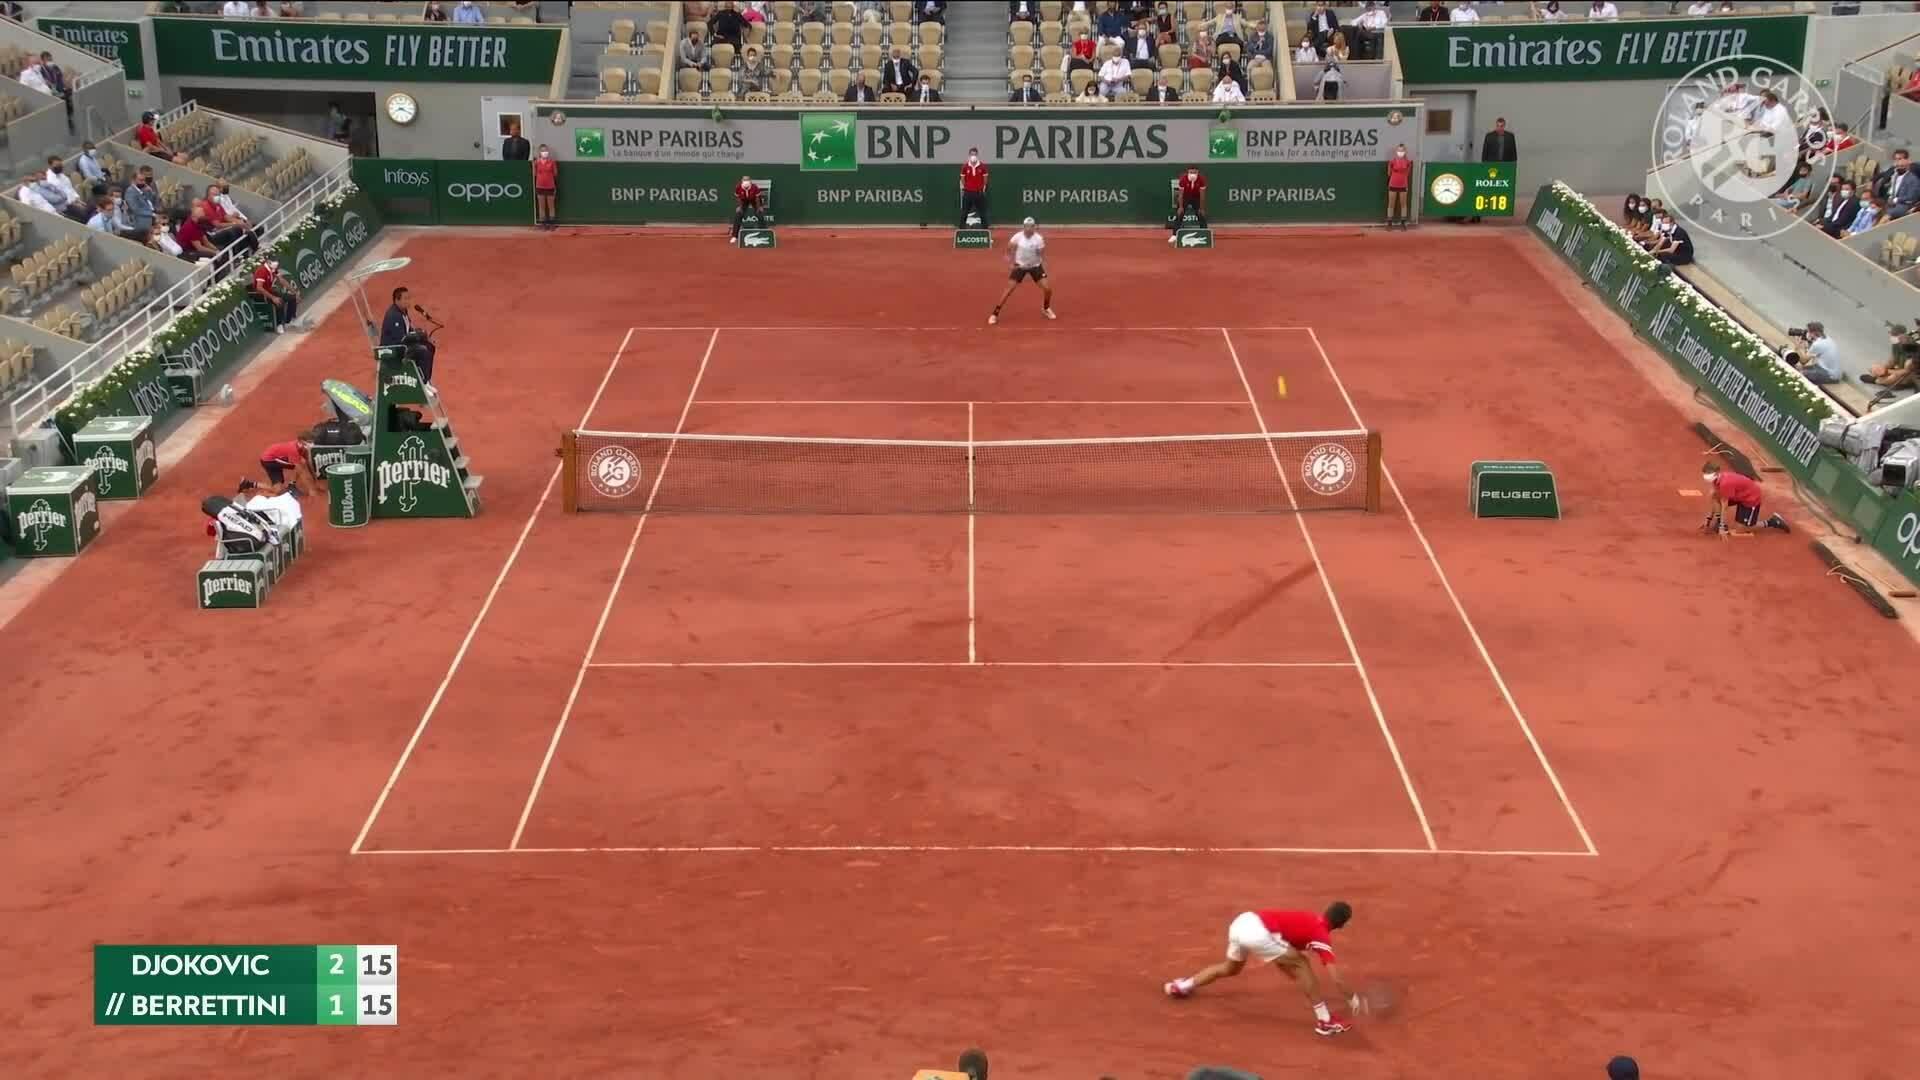 Djokovic 3-1 Berrettini